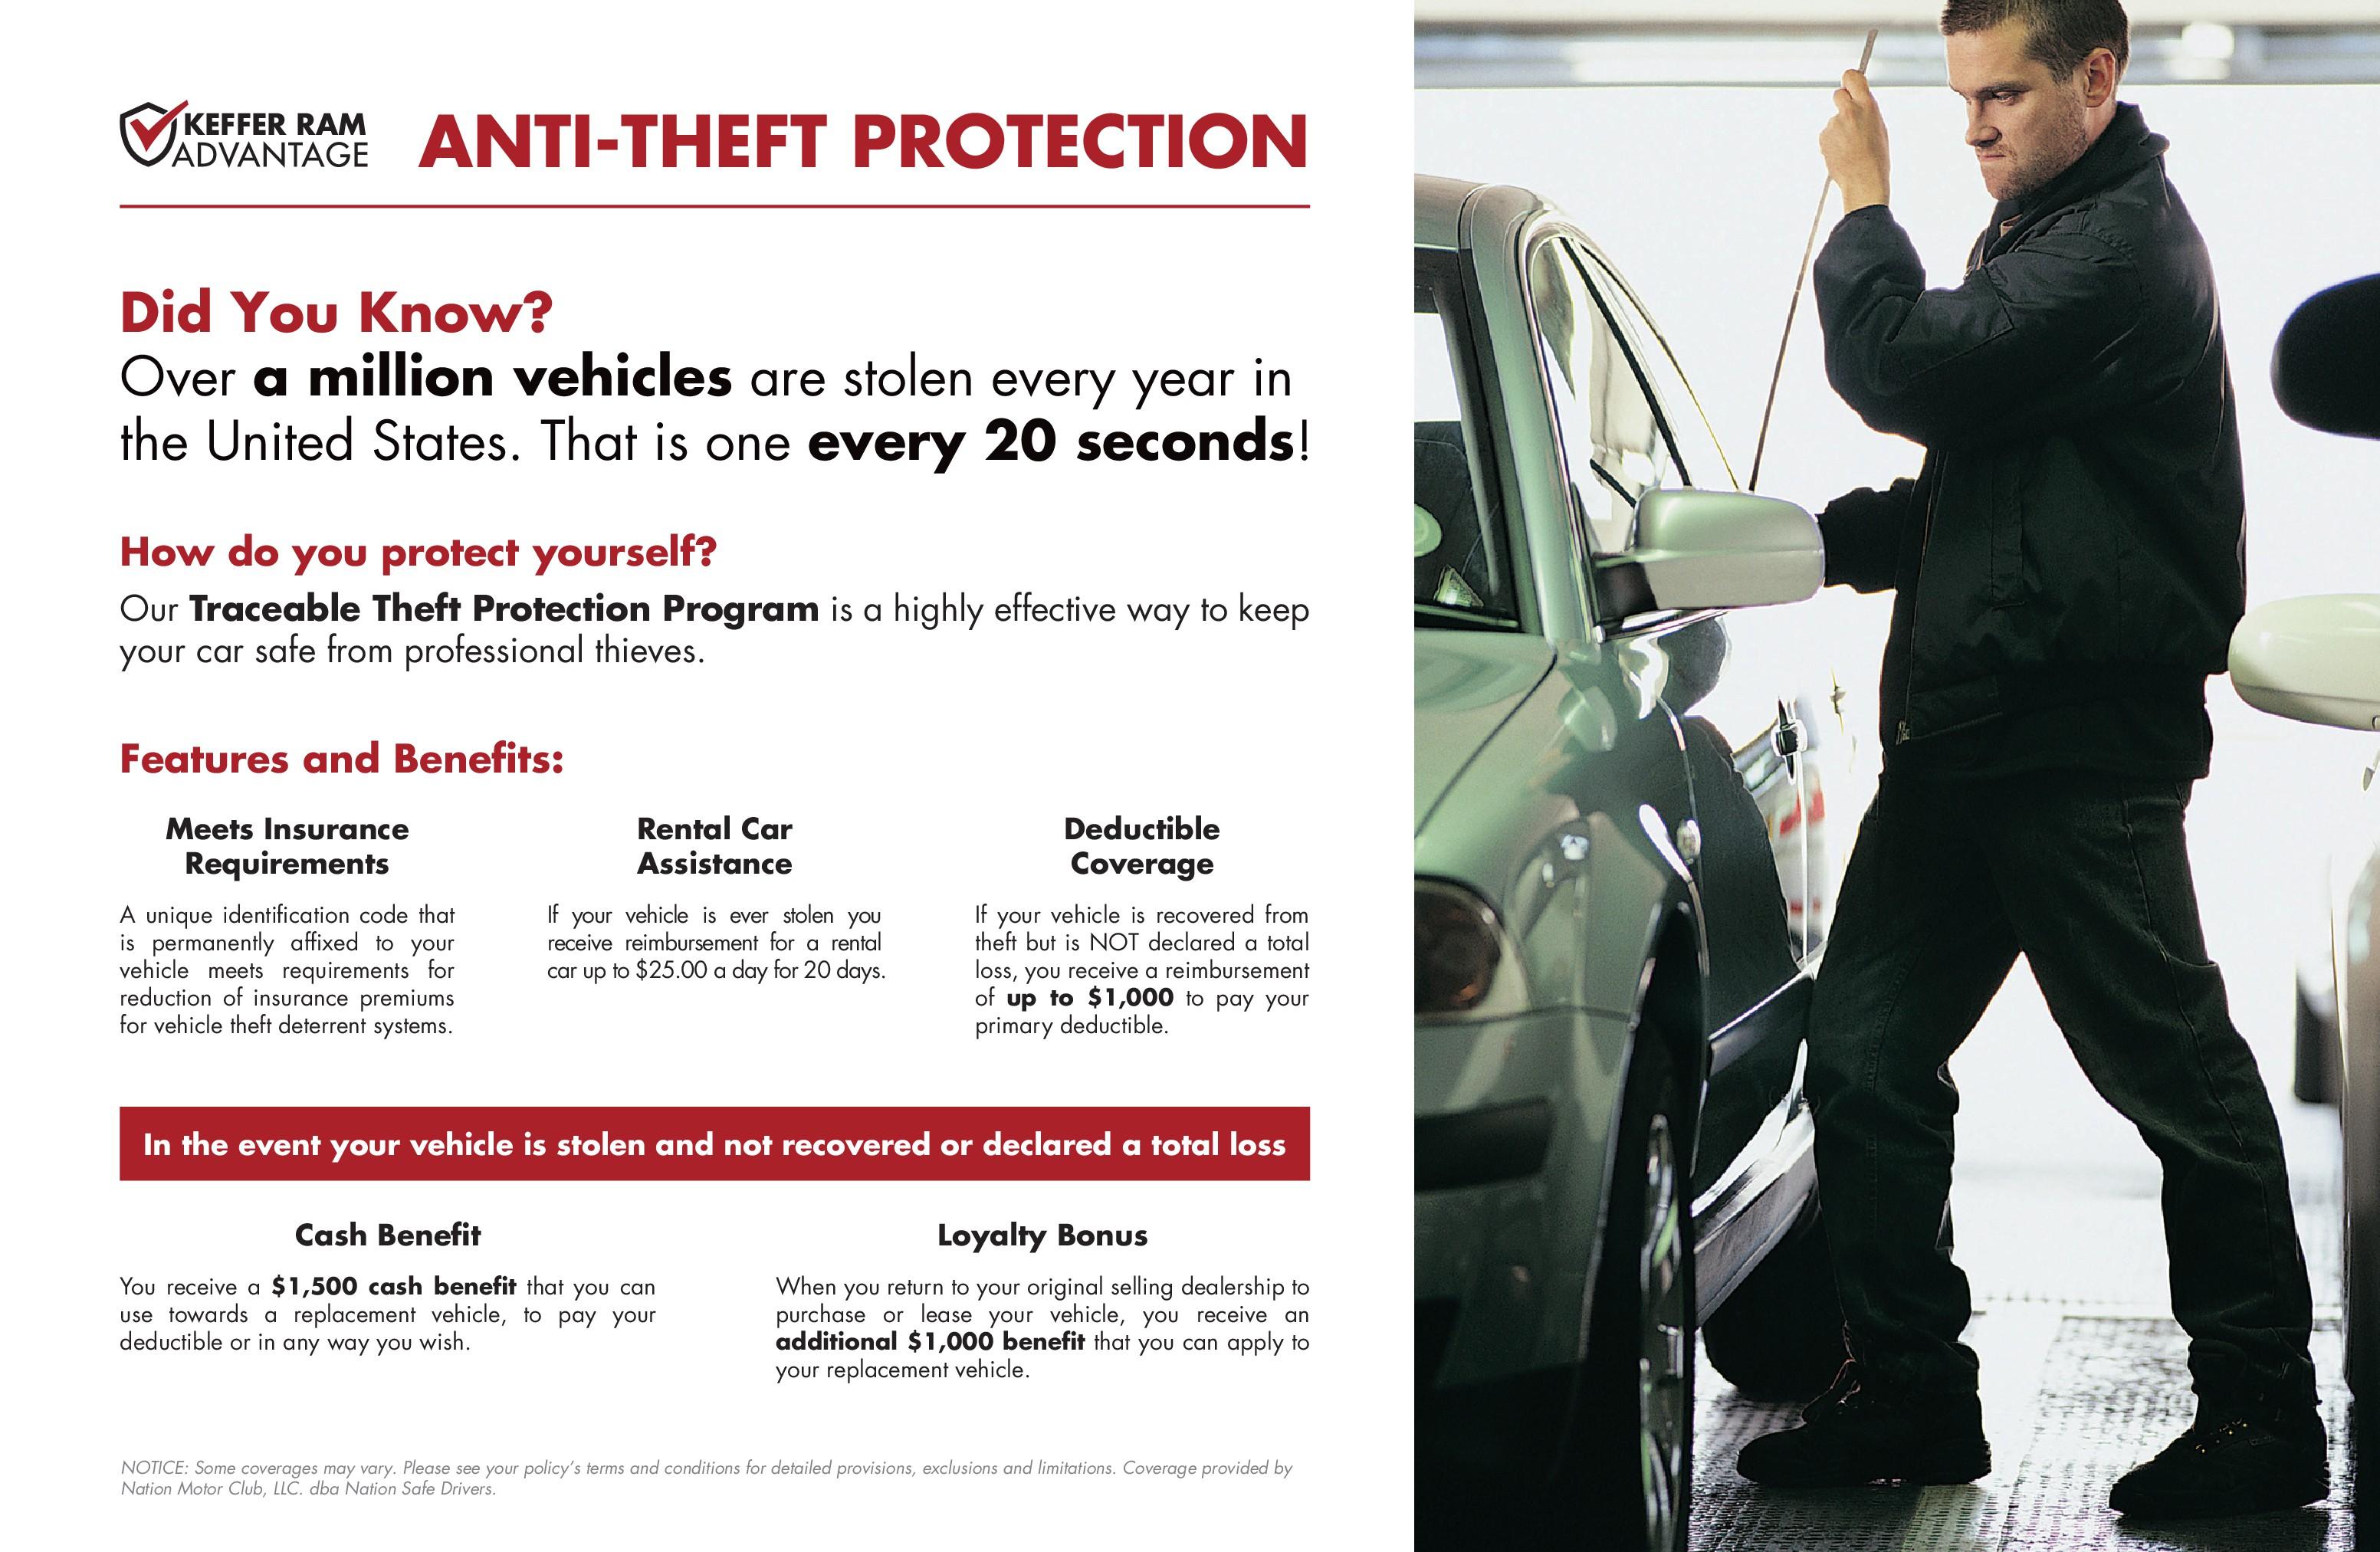 equi-pro vehicle theft deterrent system